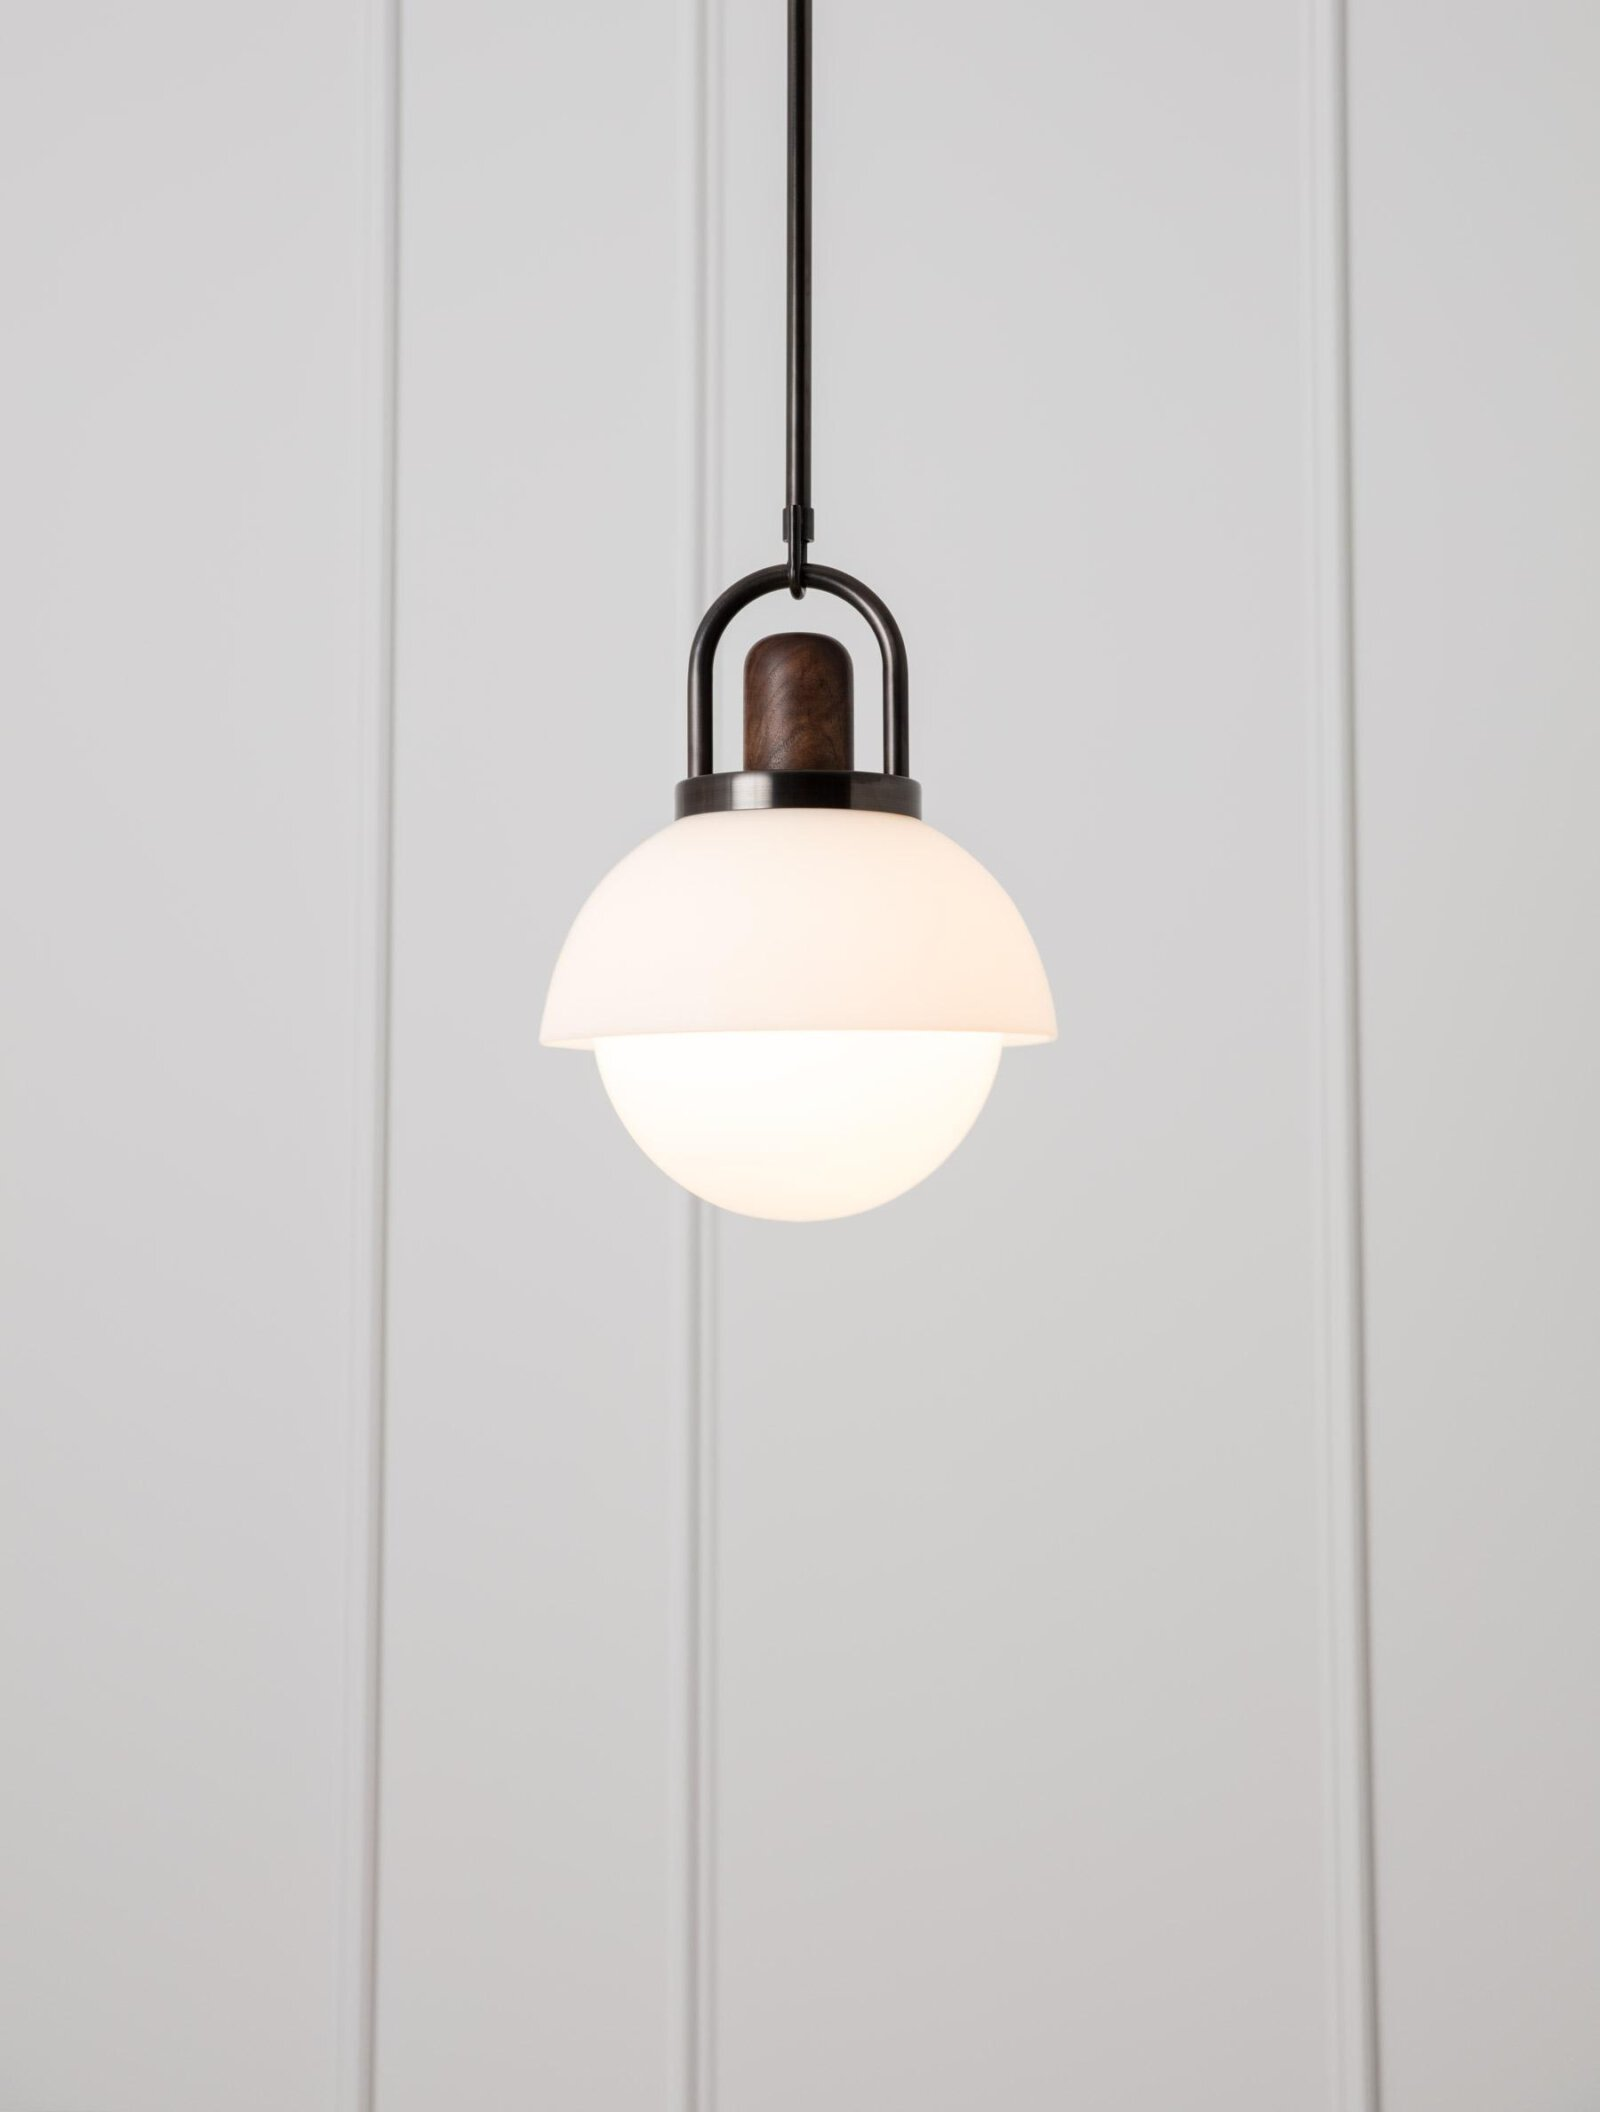 TinnappelMetz-allied-maker-glass-arc-dome-pendant-03